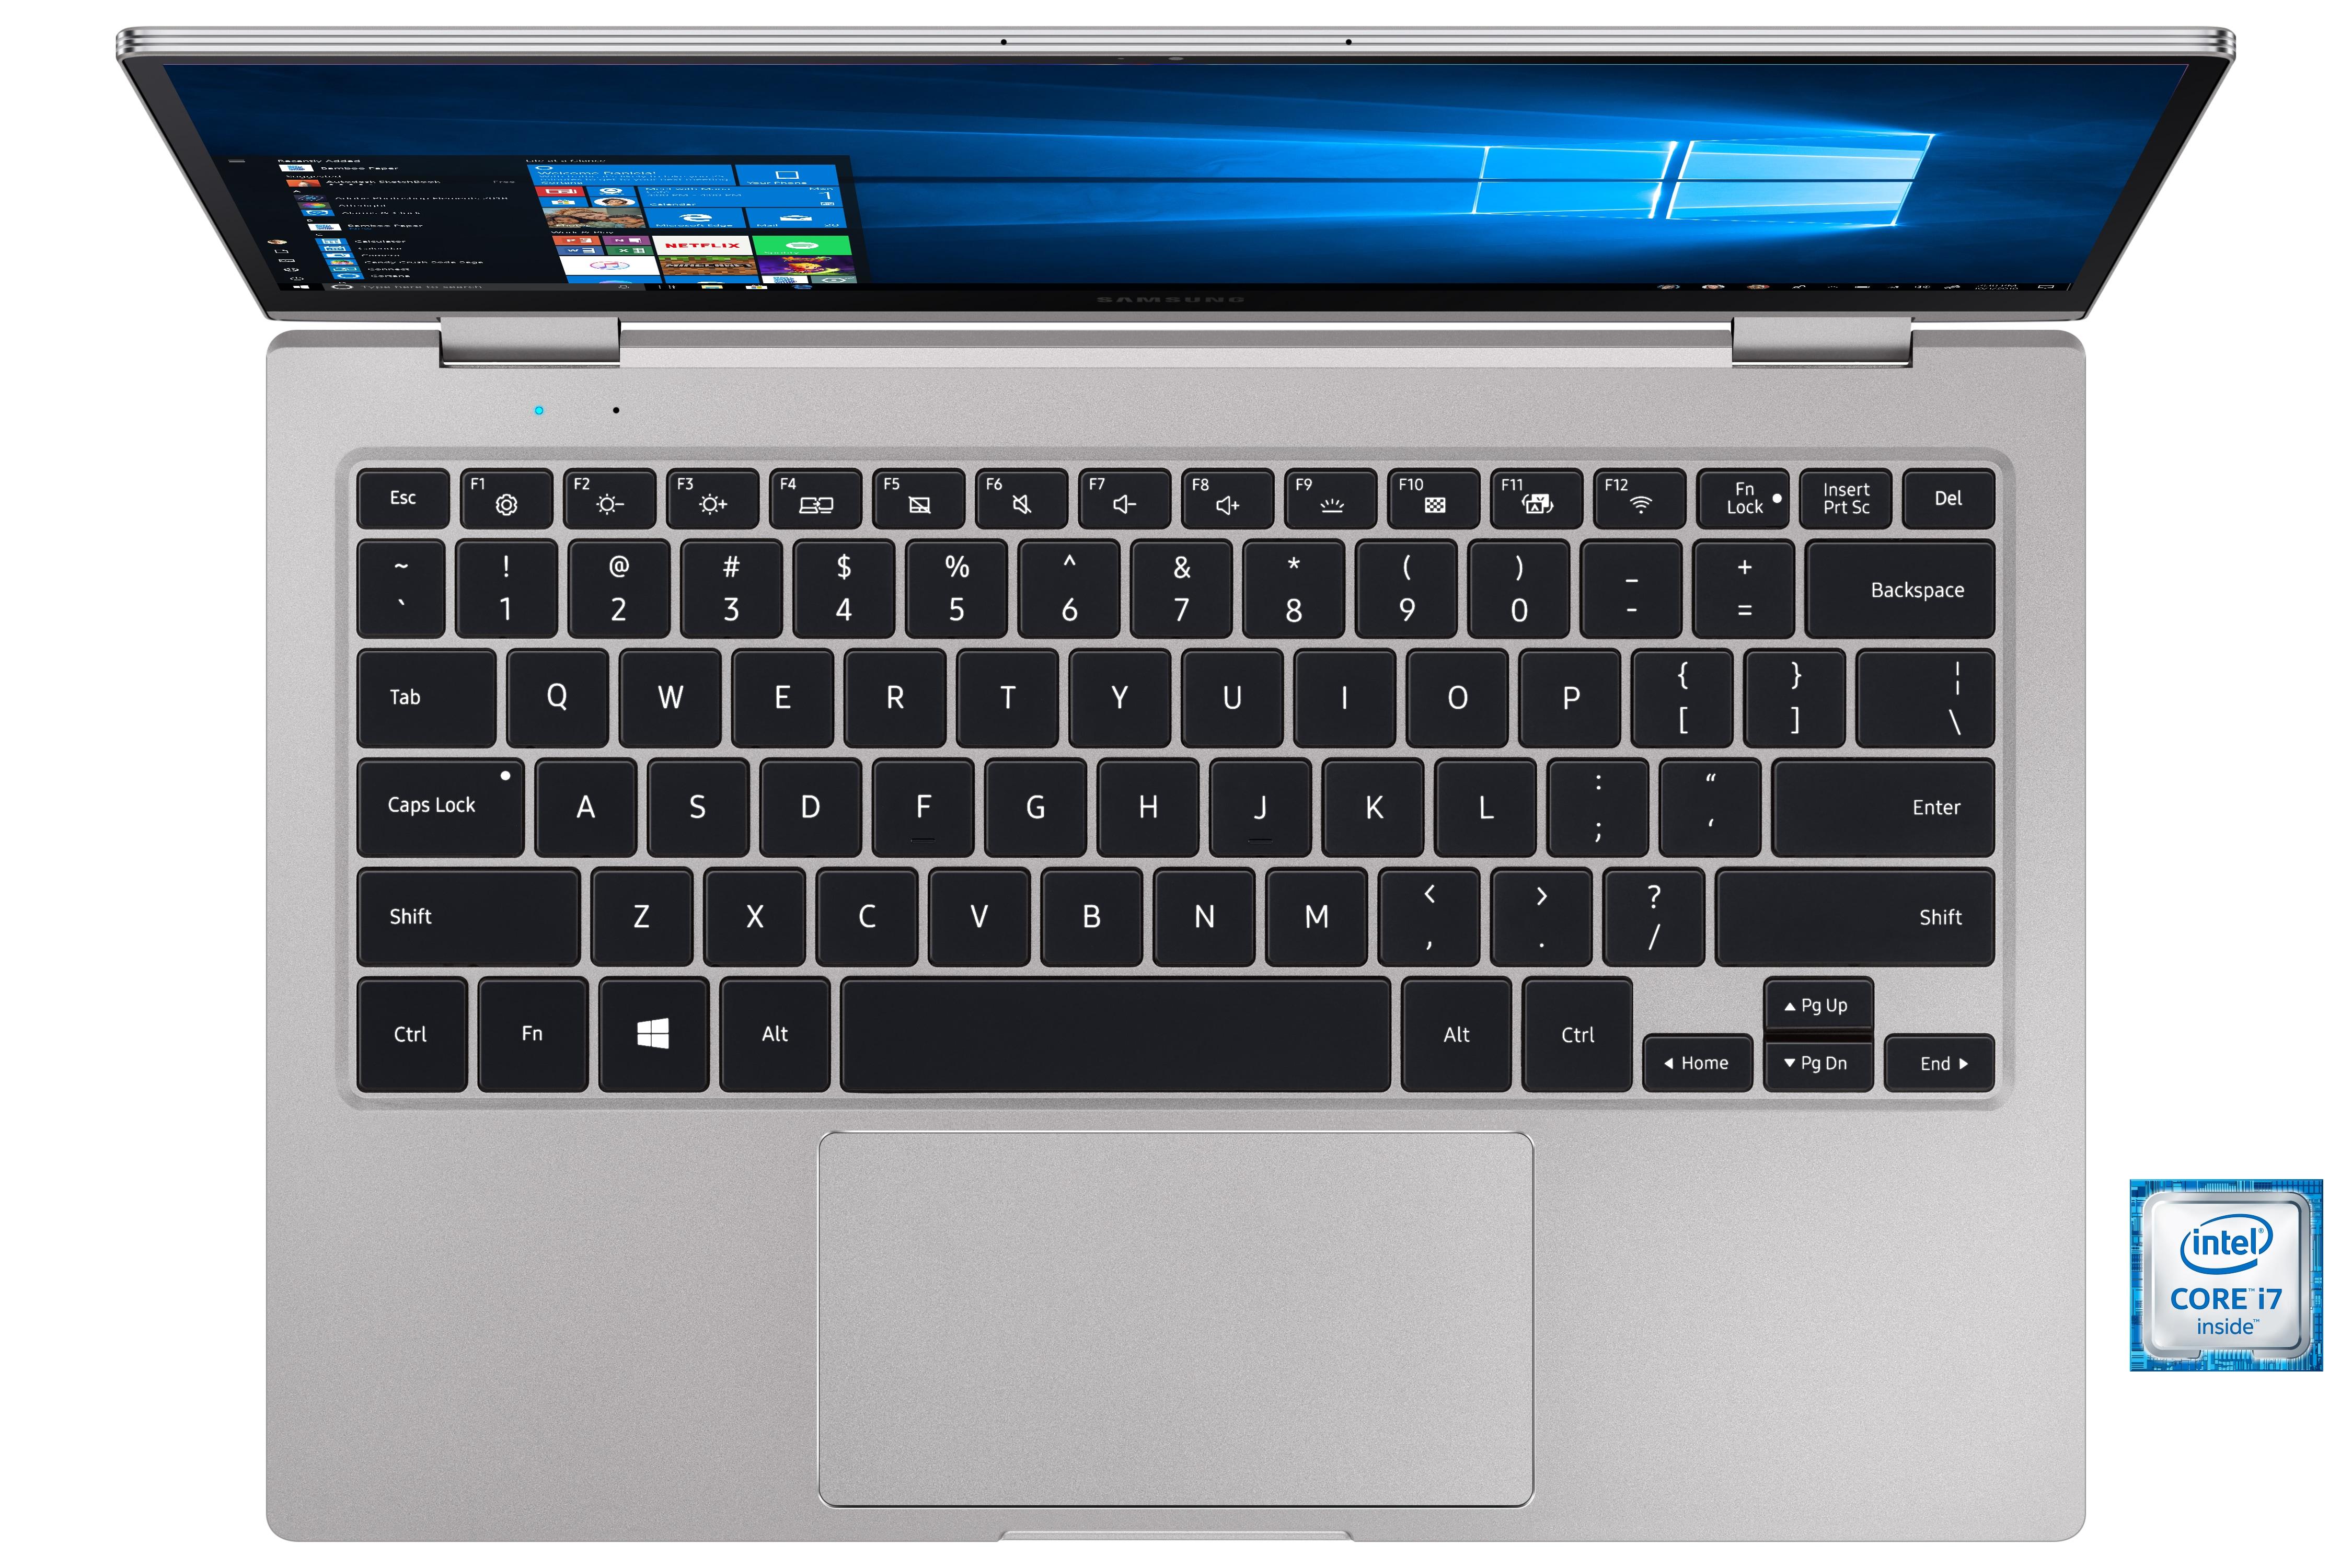 Samsung Notebook 9 NP930MBE-K04US